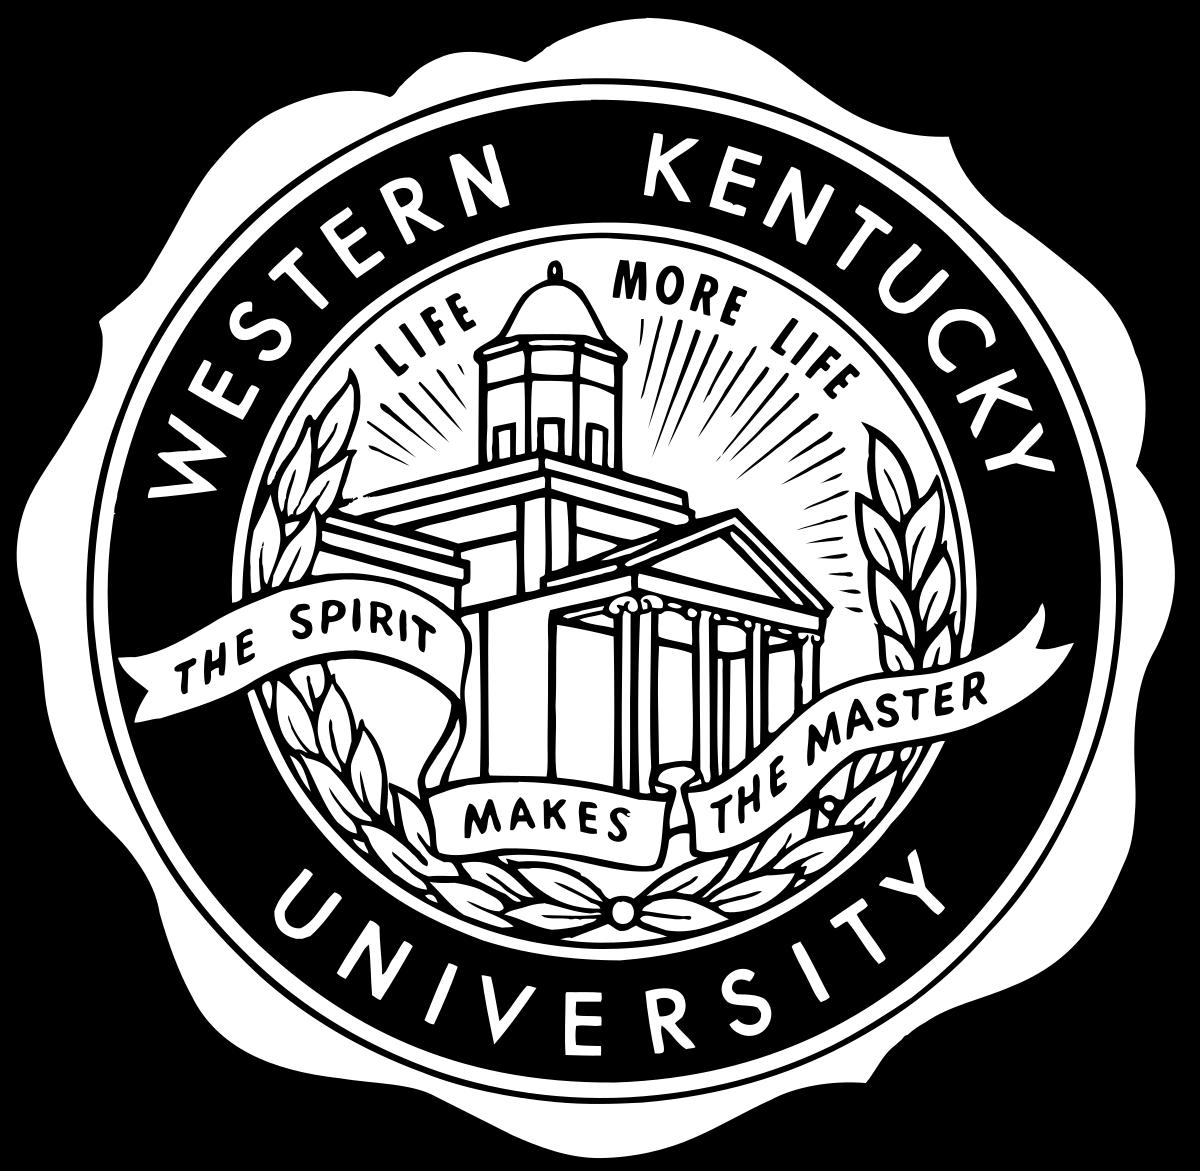 Western Kentucky University.